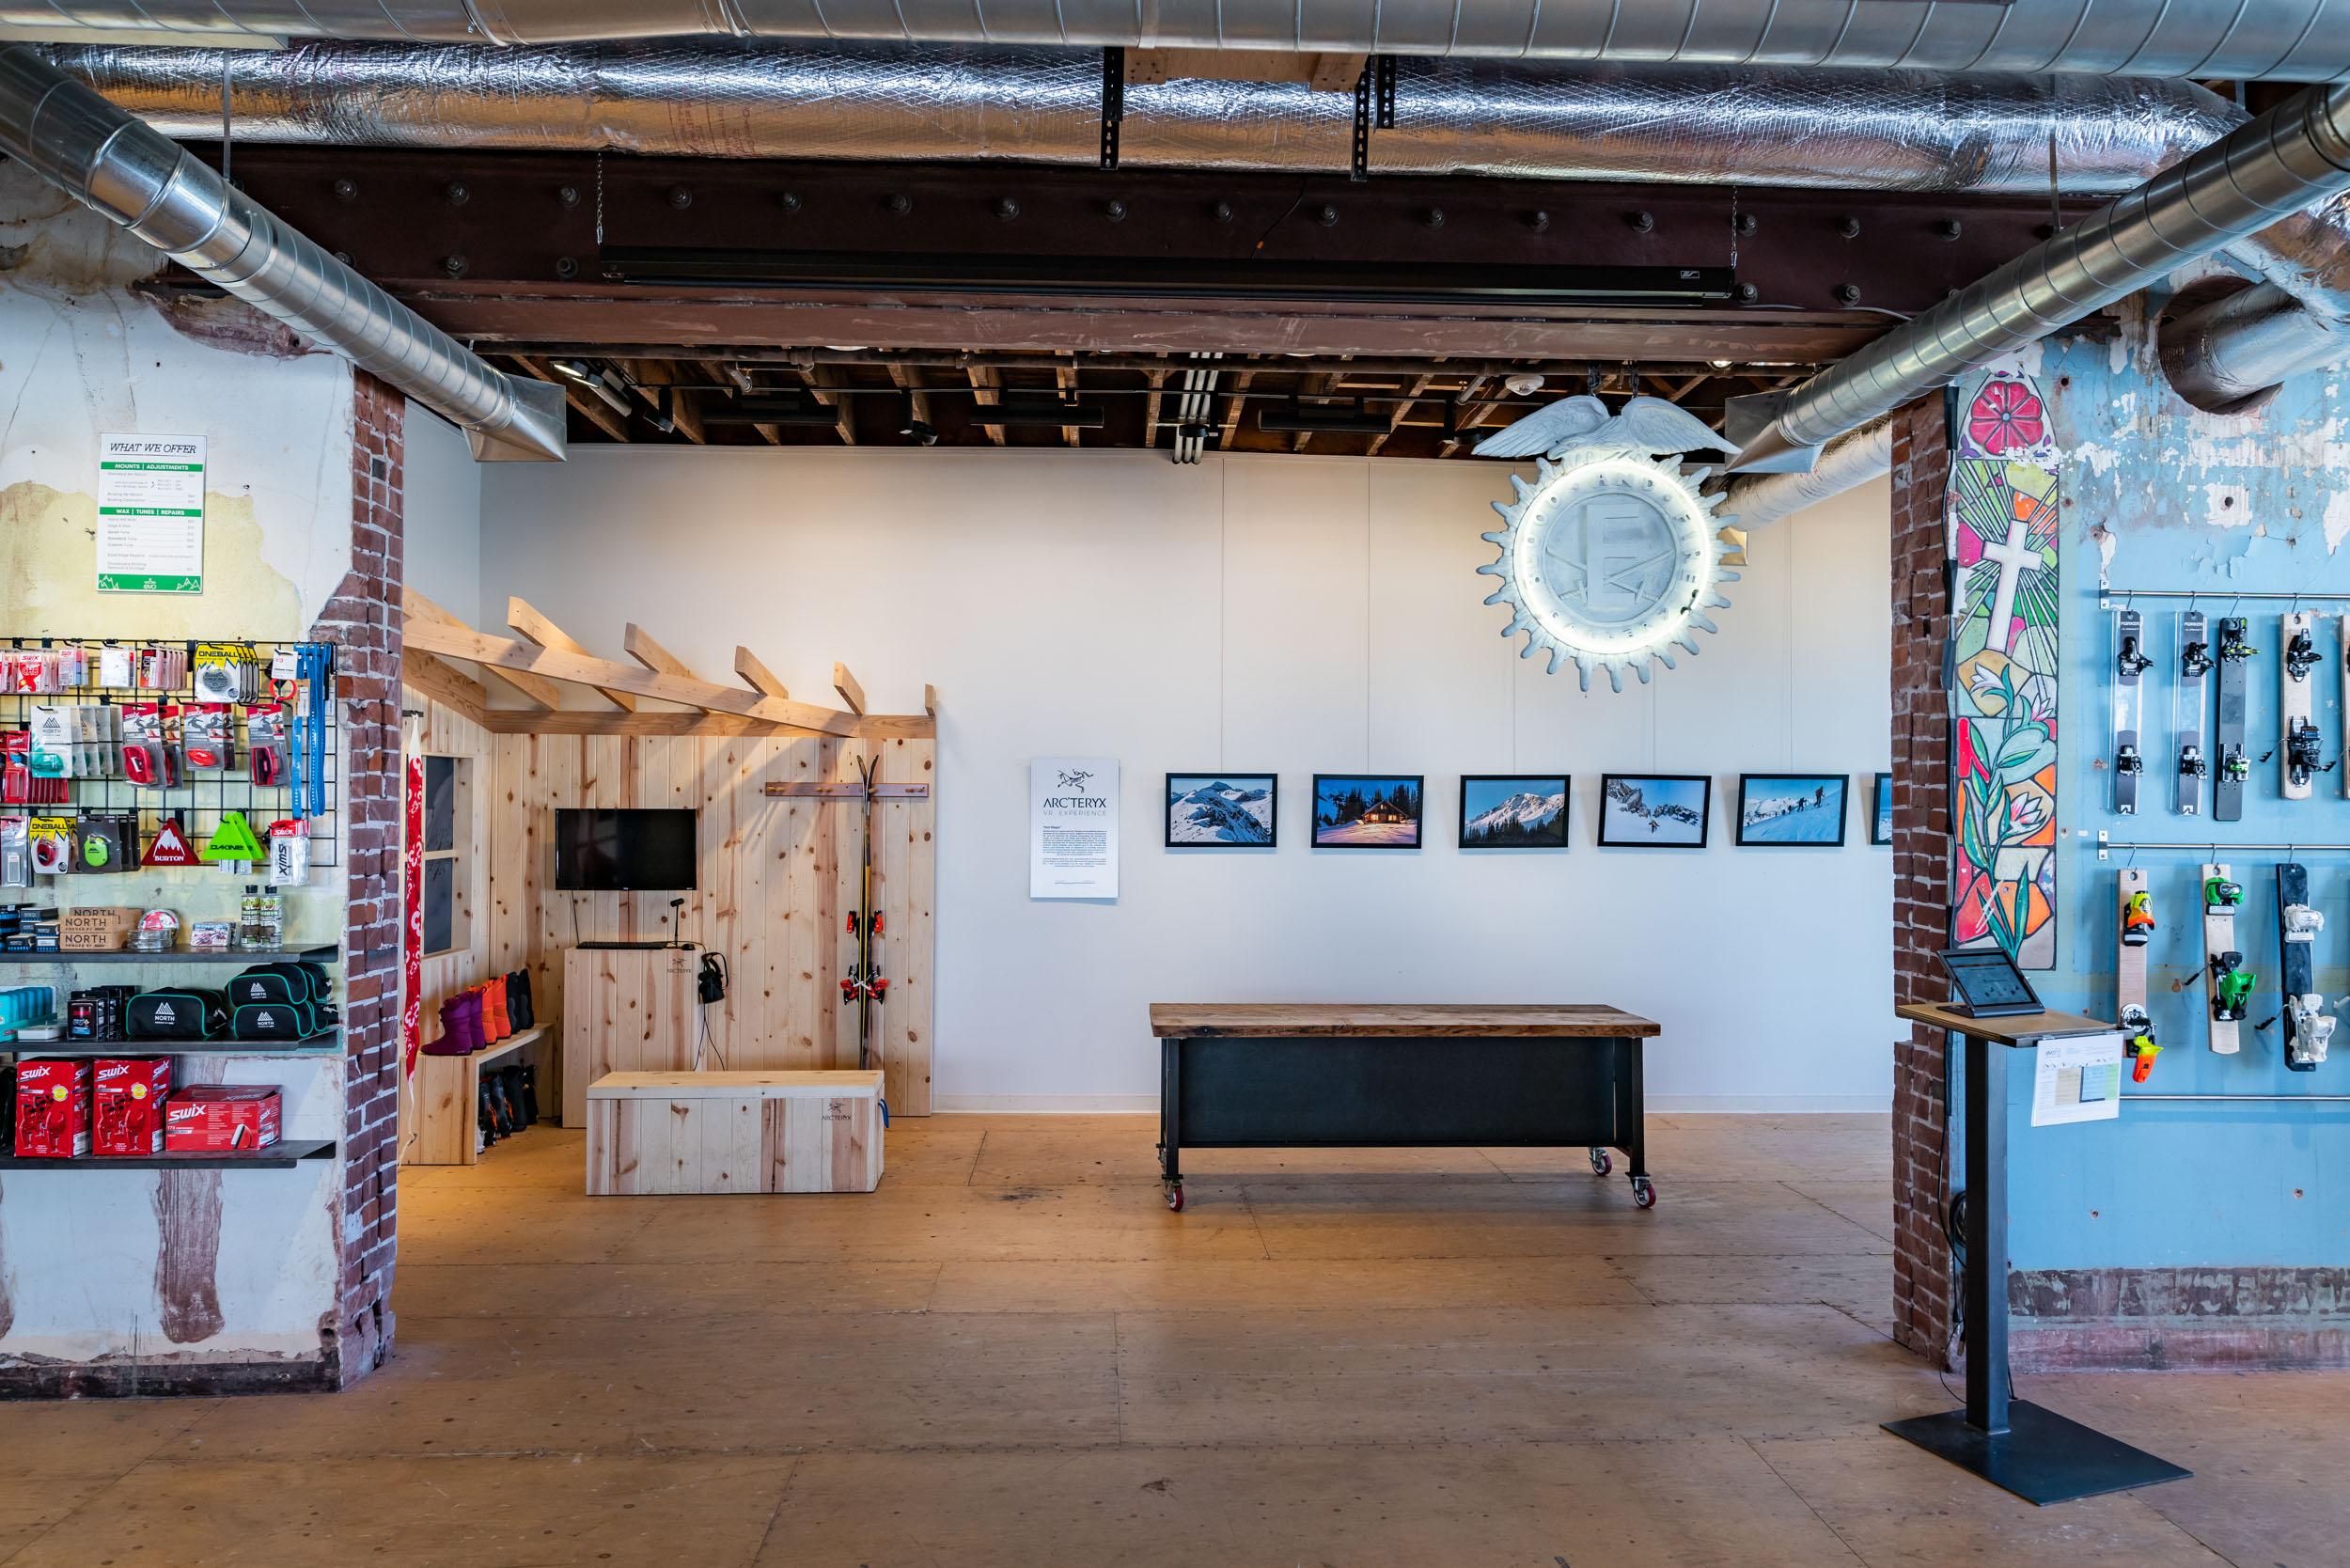 Portland EVO store: Arc'teryx Hut Magic Installation 2019, photos supplied for gallery